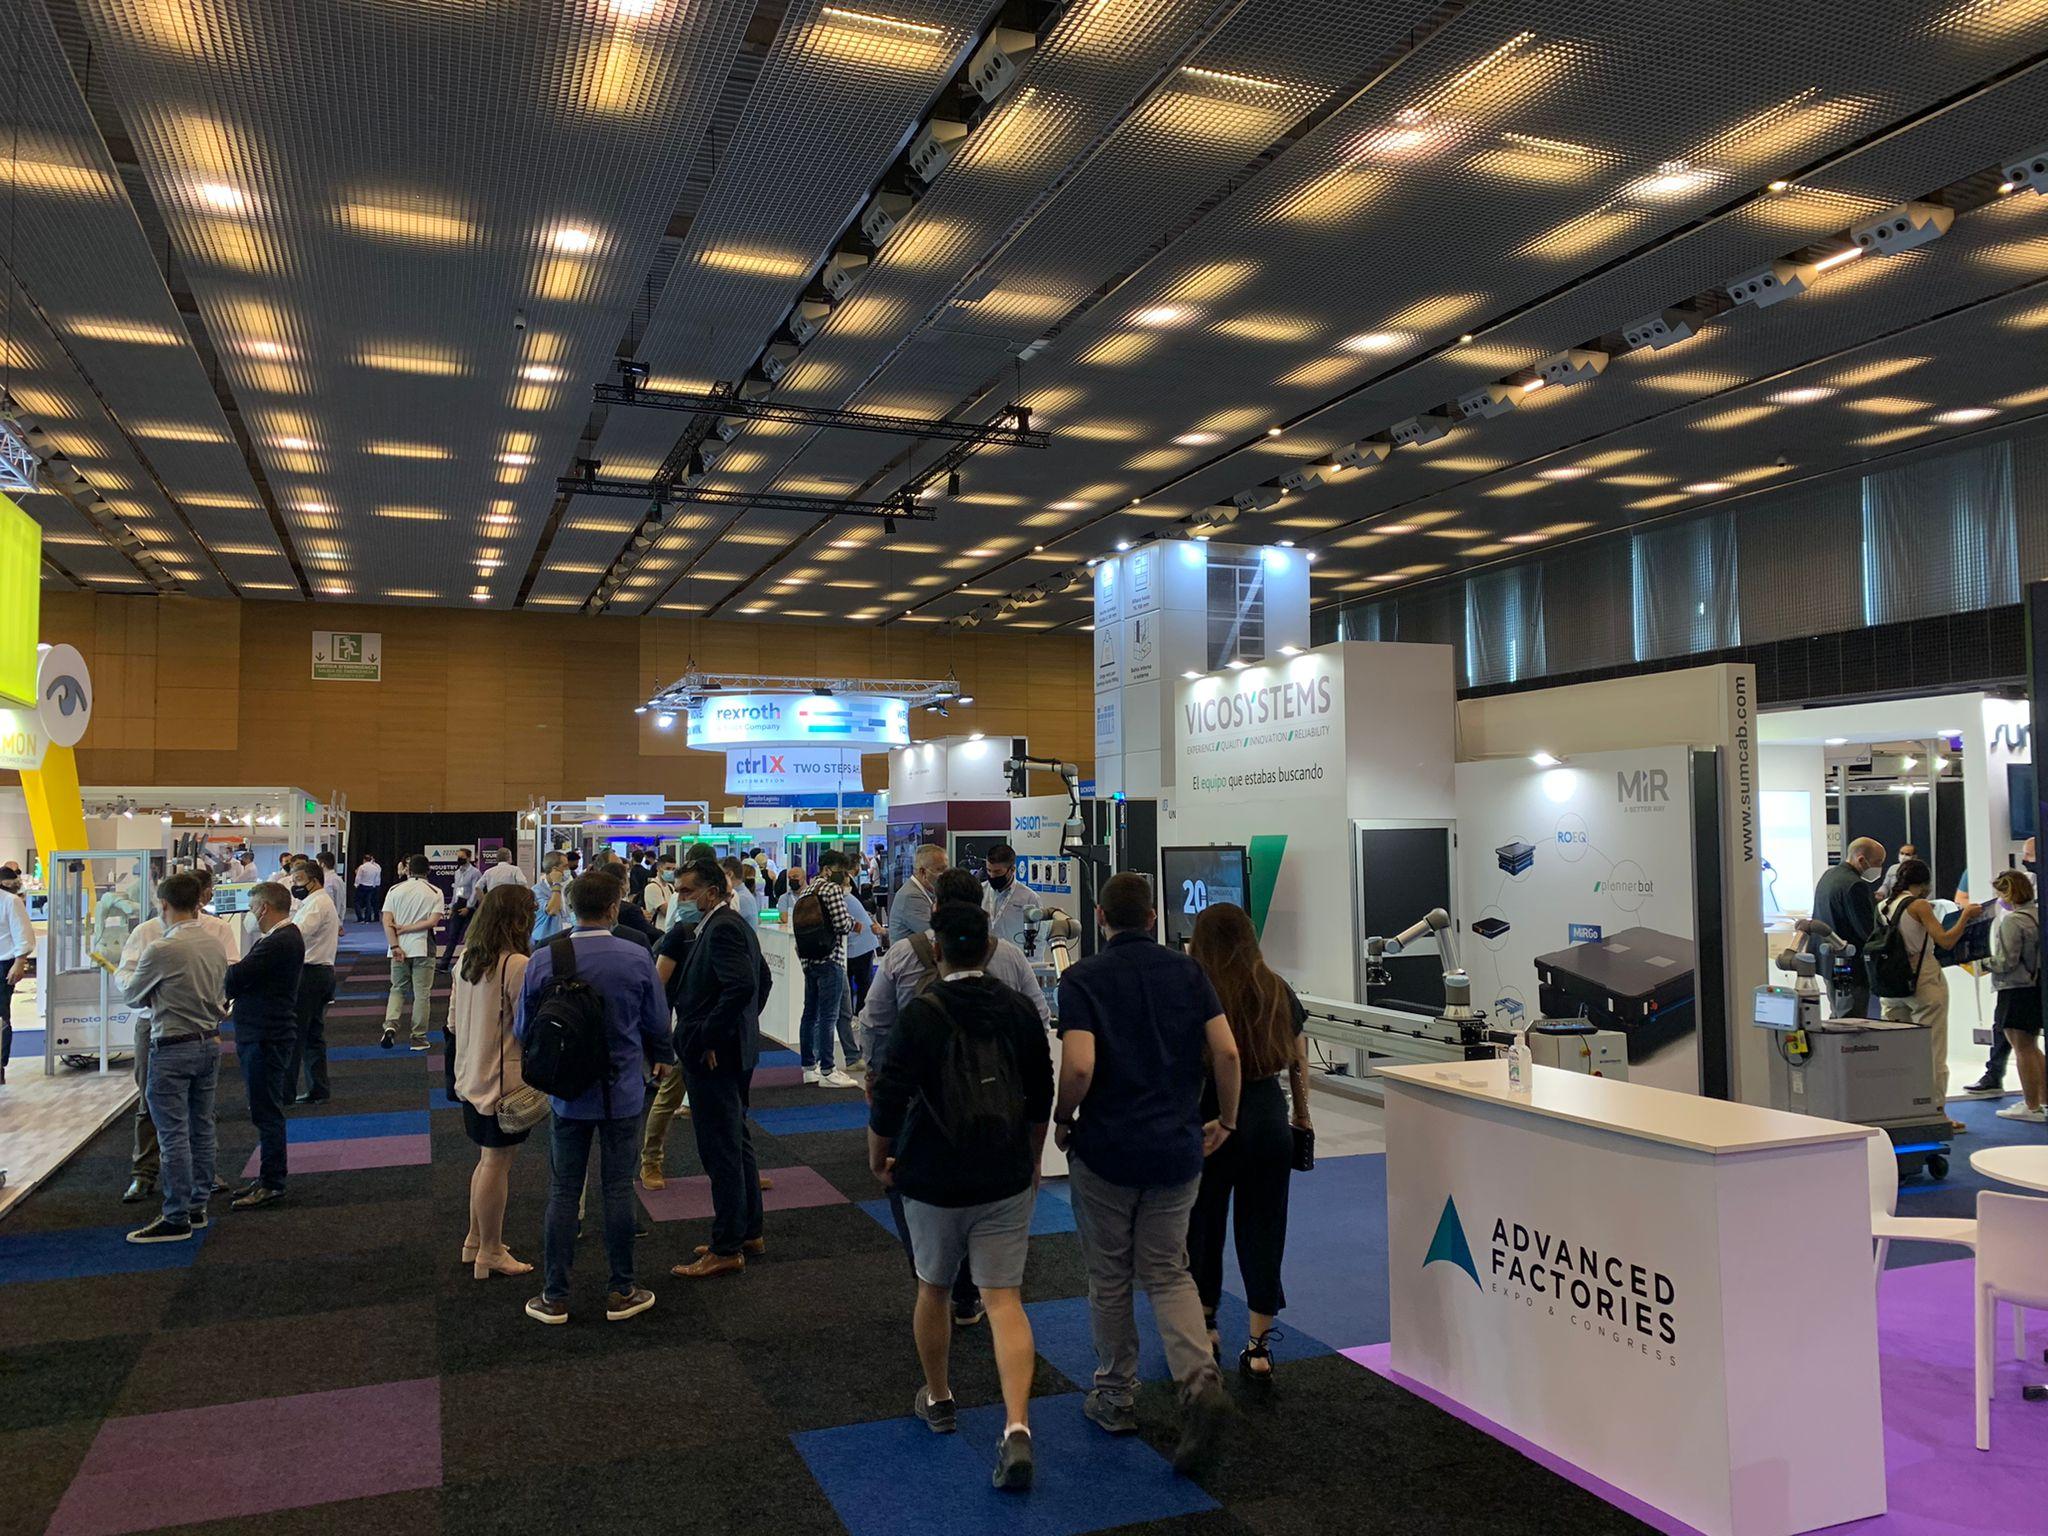 Advanced_Factories_industria